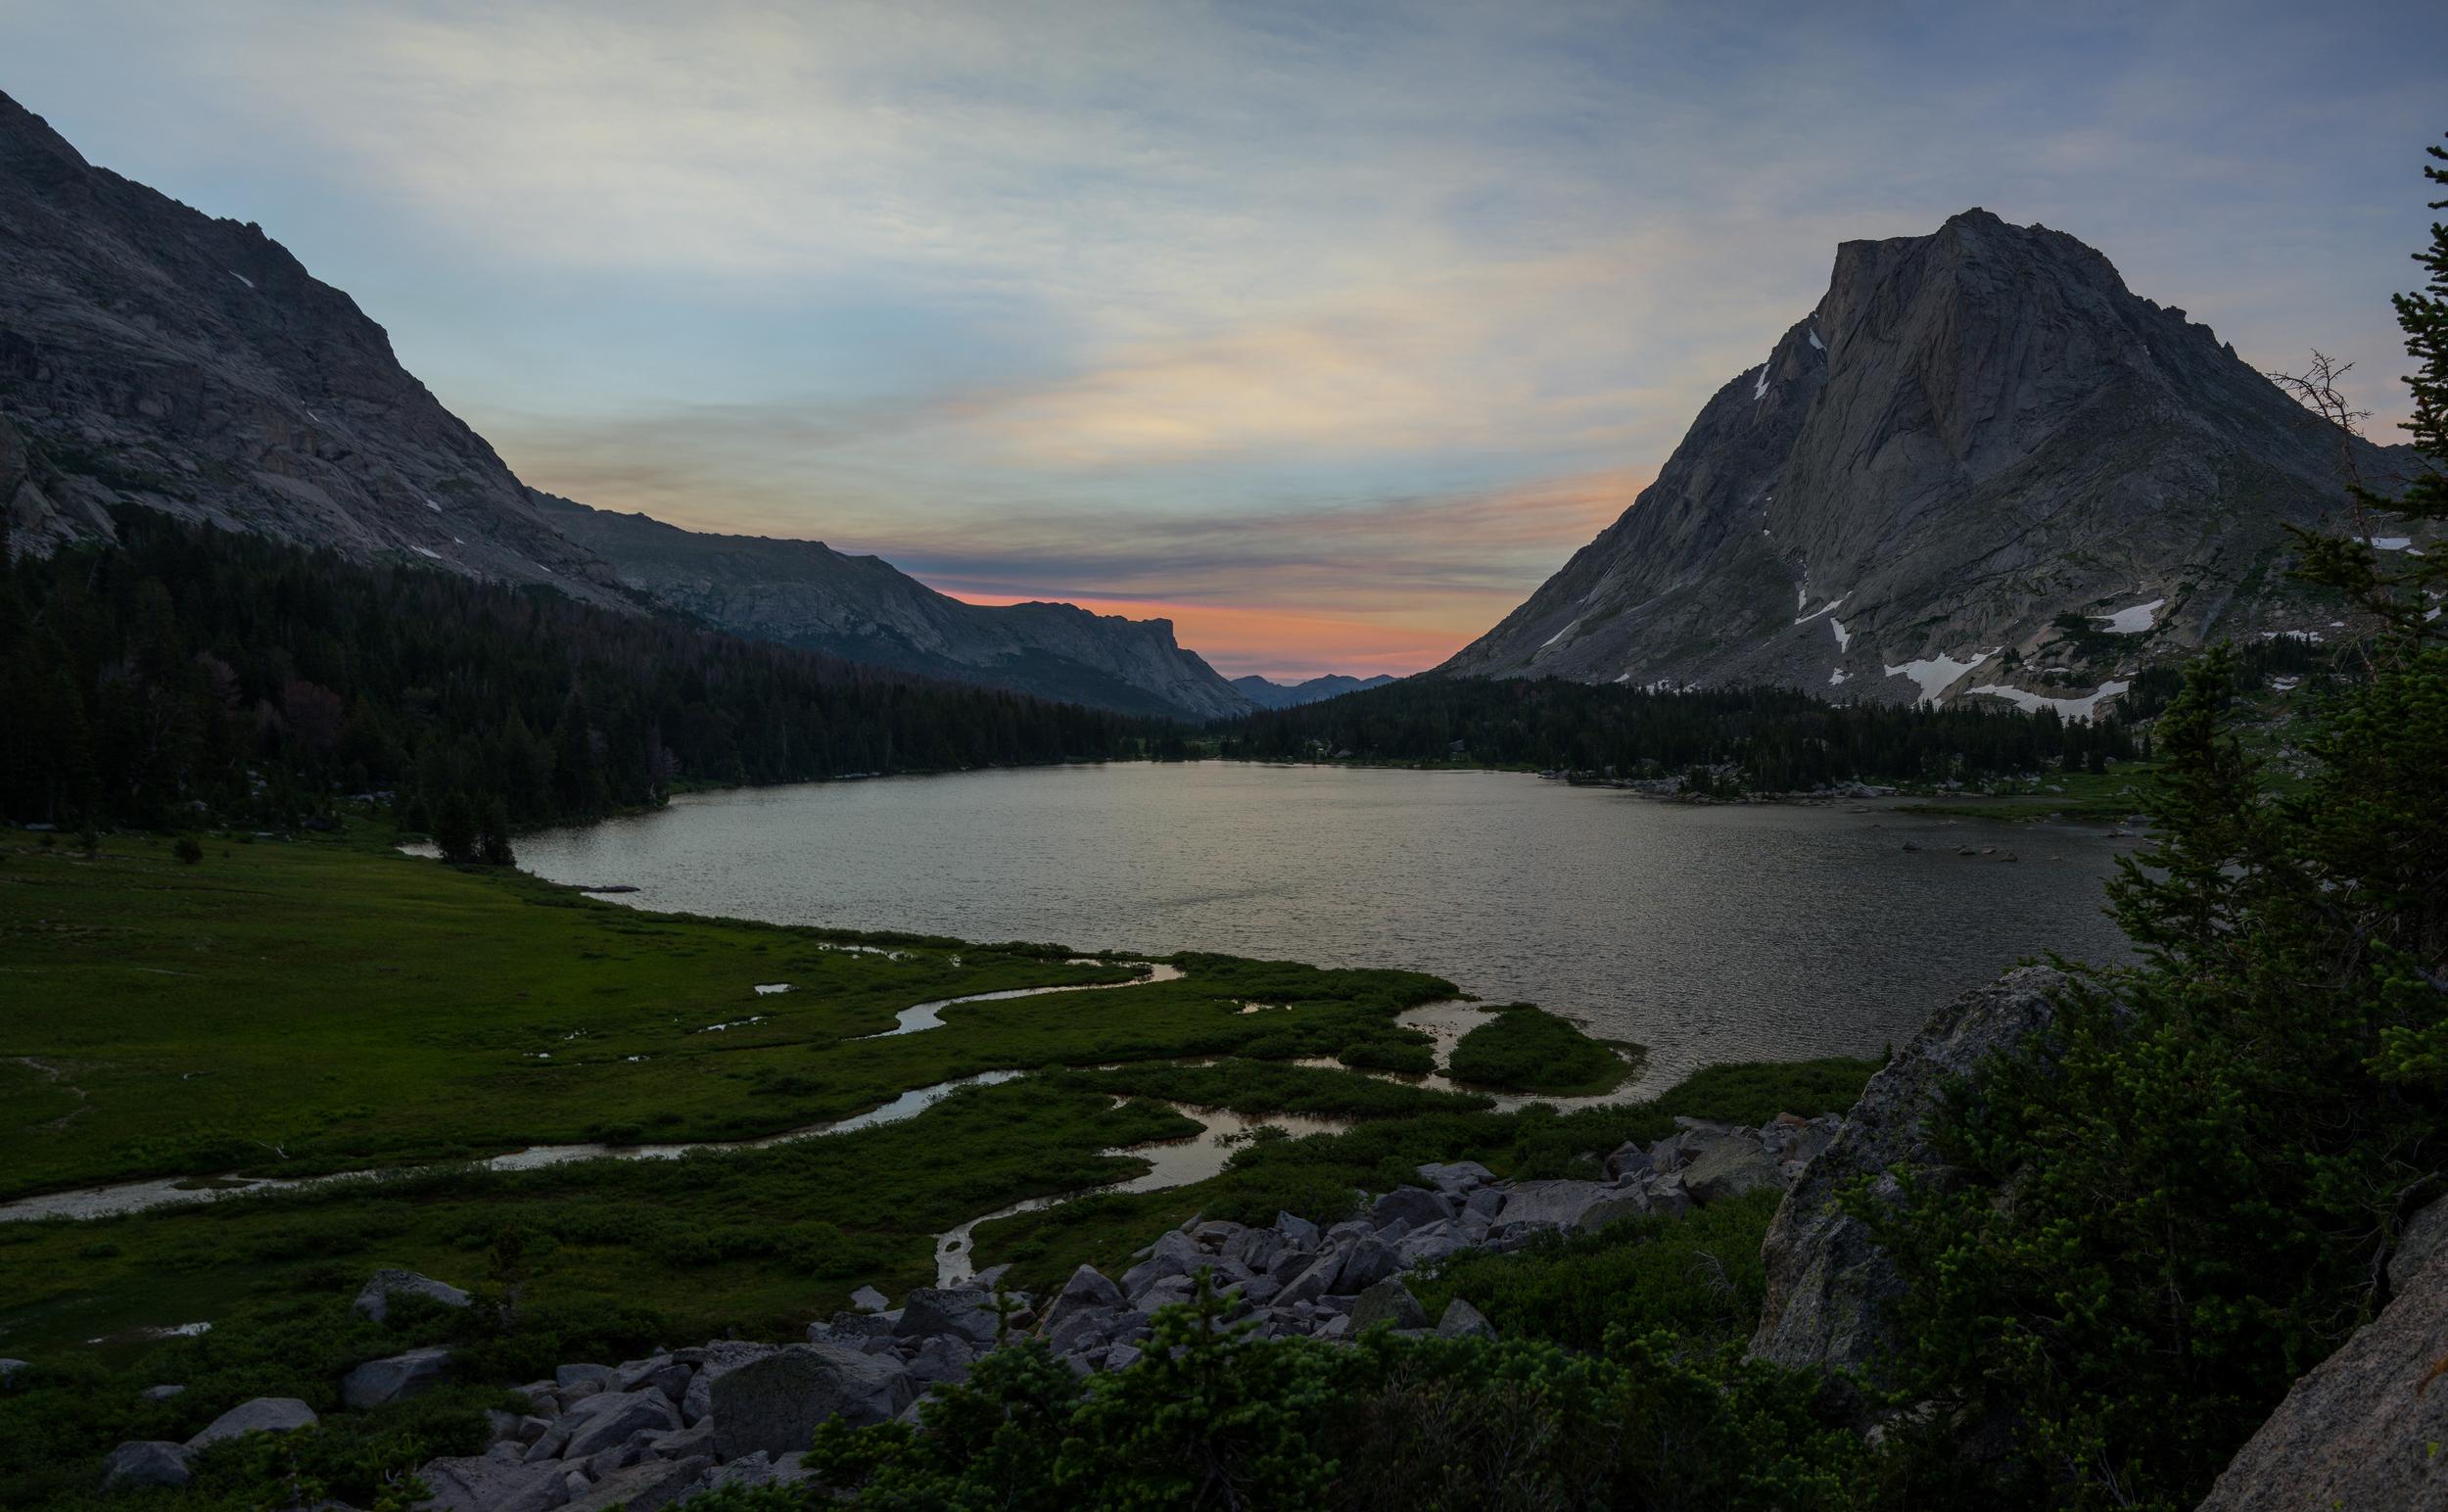 Sunrise at Lonesome Lake_14612429810_o.jpg